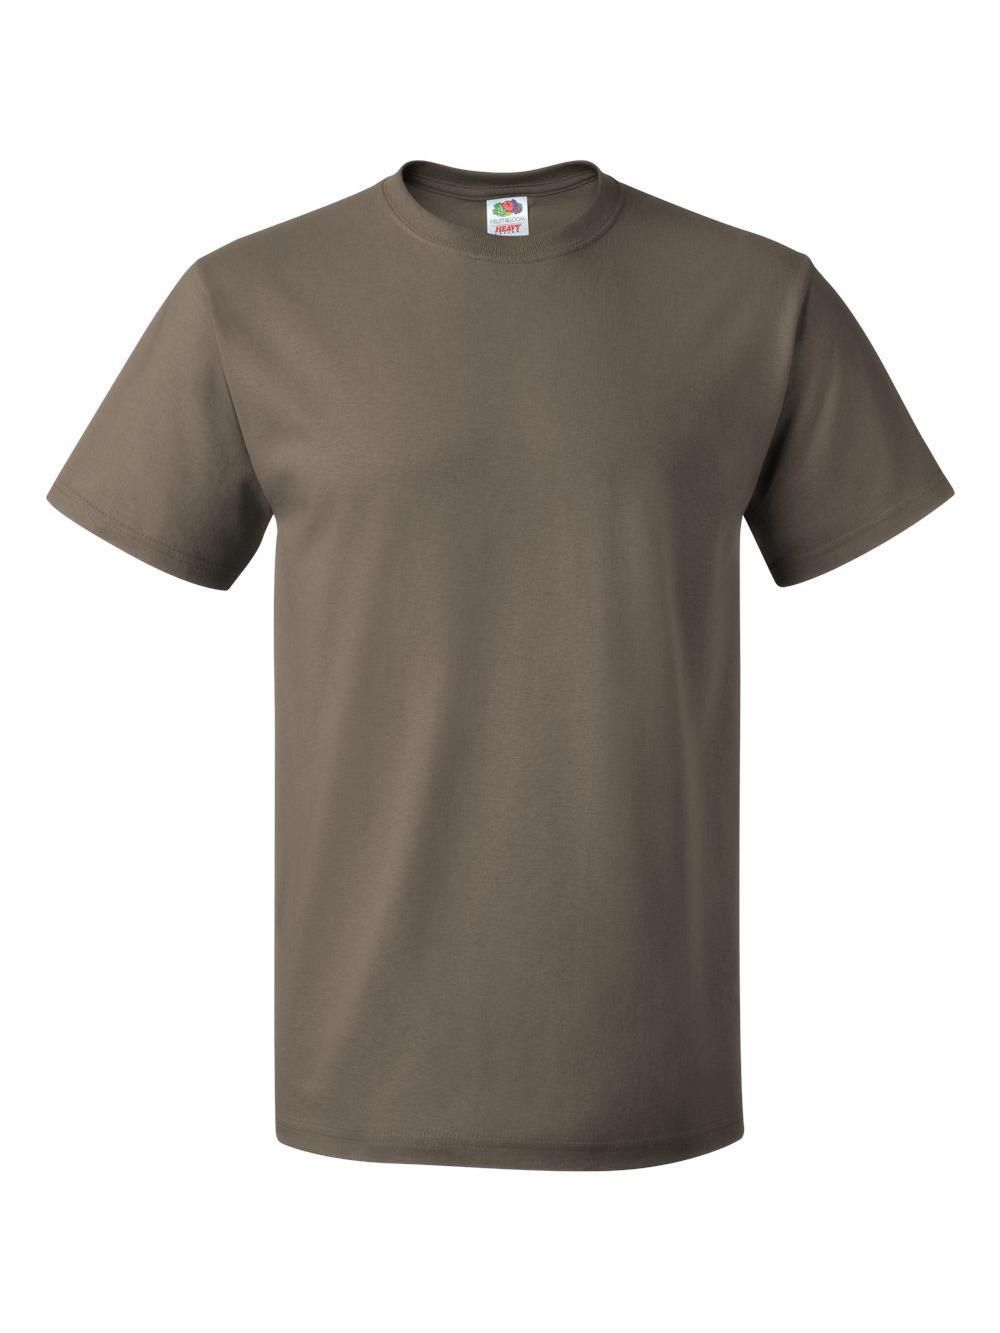 Fruit-of-the-Loom-HD-Cotton-Short-Sleeve-T-Shirt-3930R thumbnail 114